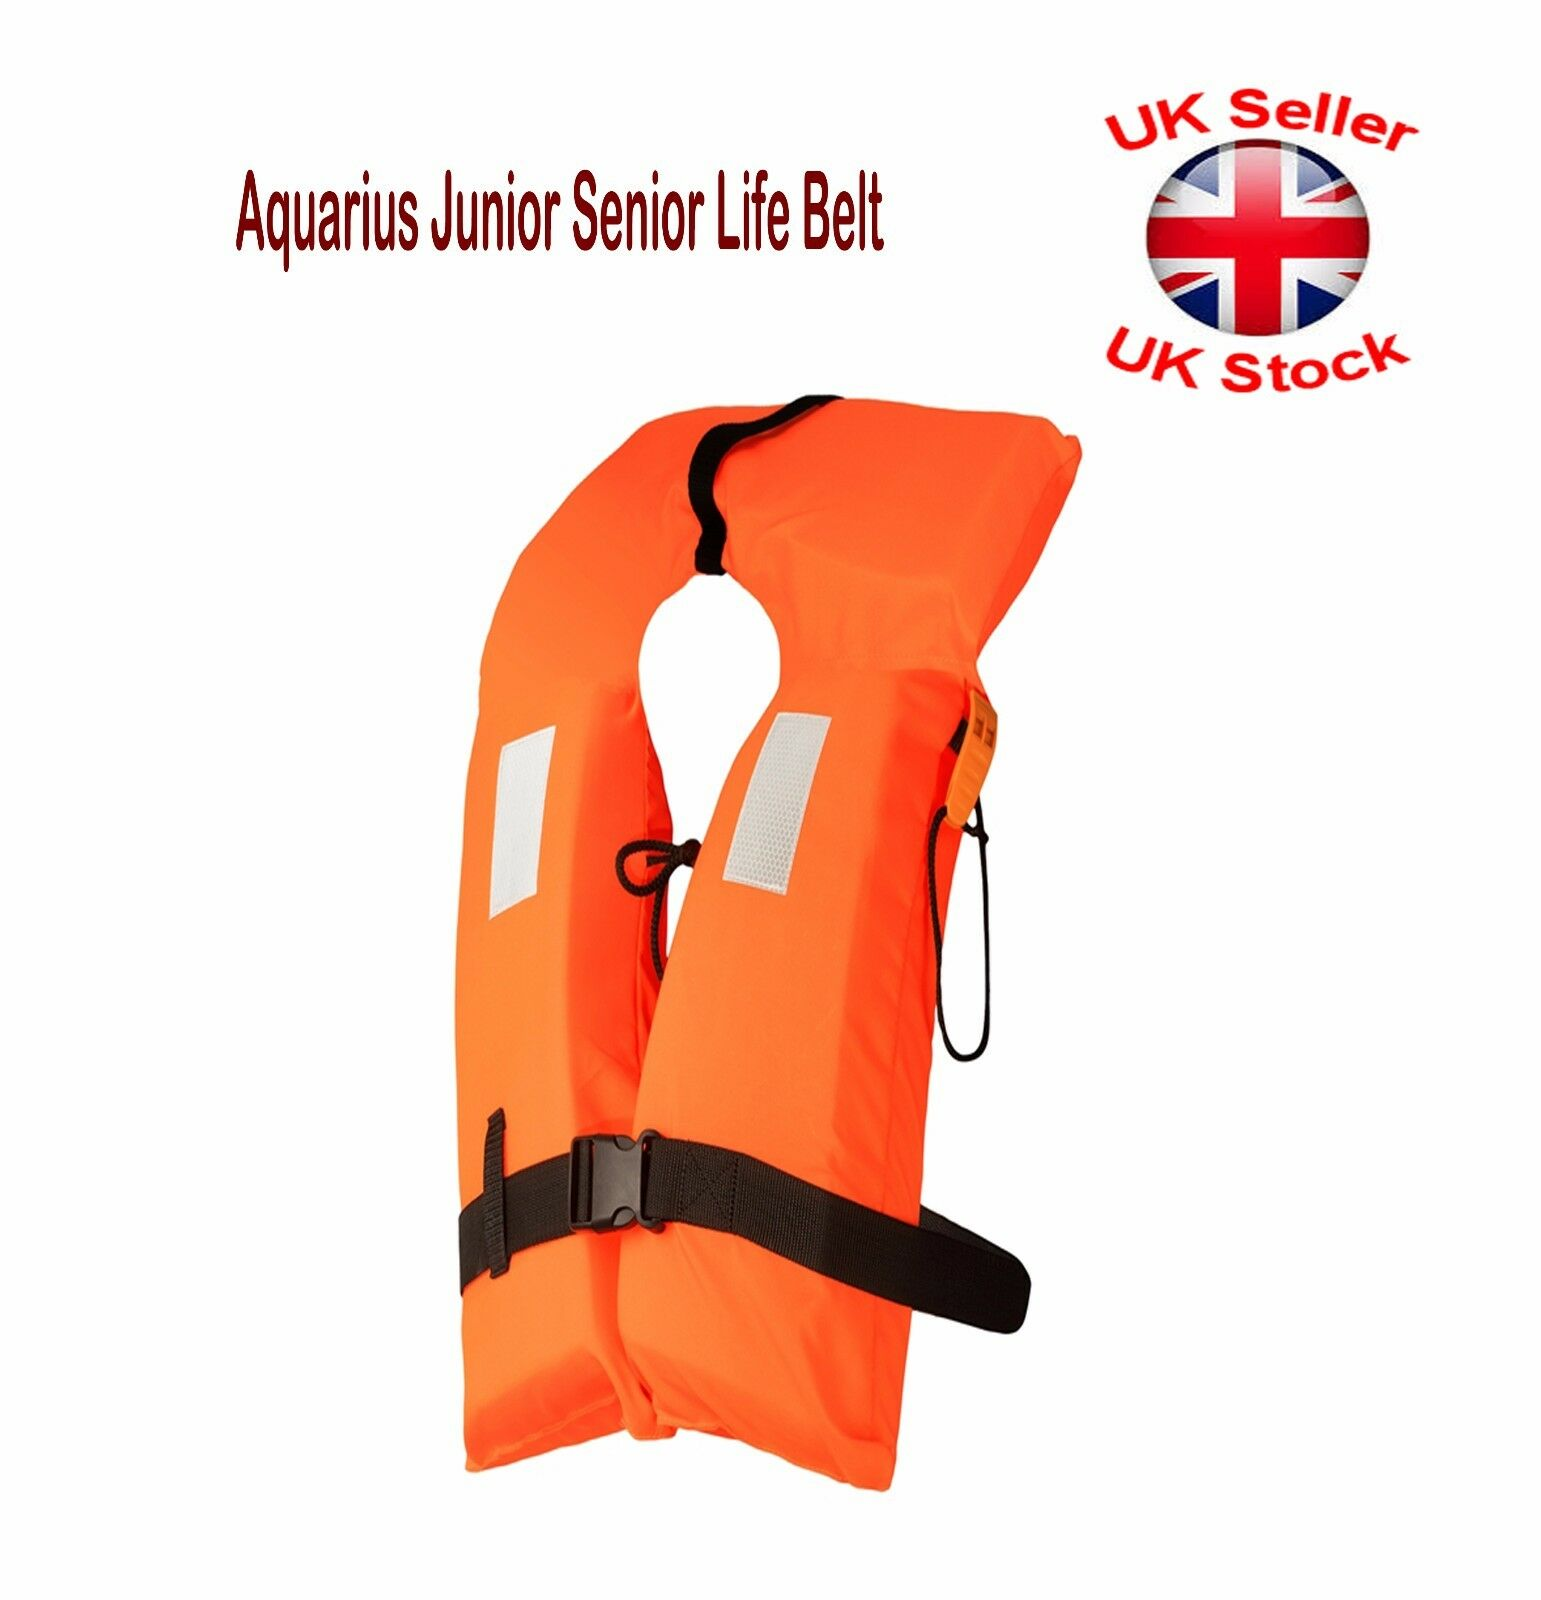 Aquarius Junior Senior Life Belt Buoyancy 100N PFD With Whistle ISO-4 CE 2 Sizes